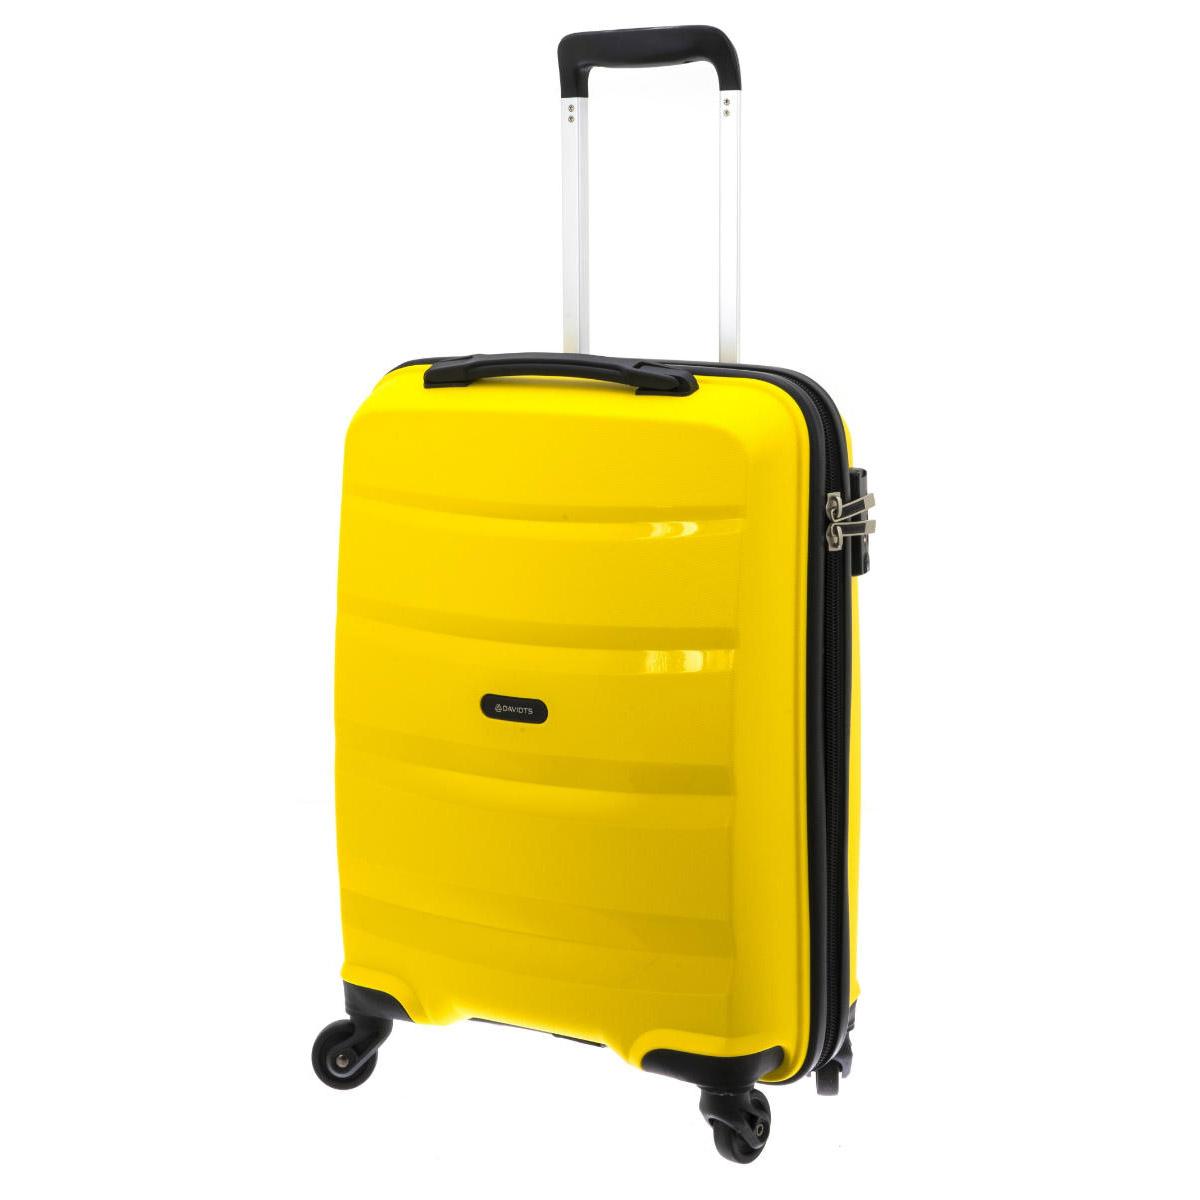 Valise trolley coque polypropylène \'Davidt\'s\' jaune (format cabine) - 55x38x20 cm - [Q3491]